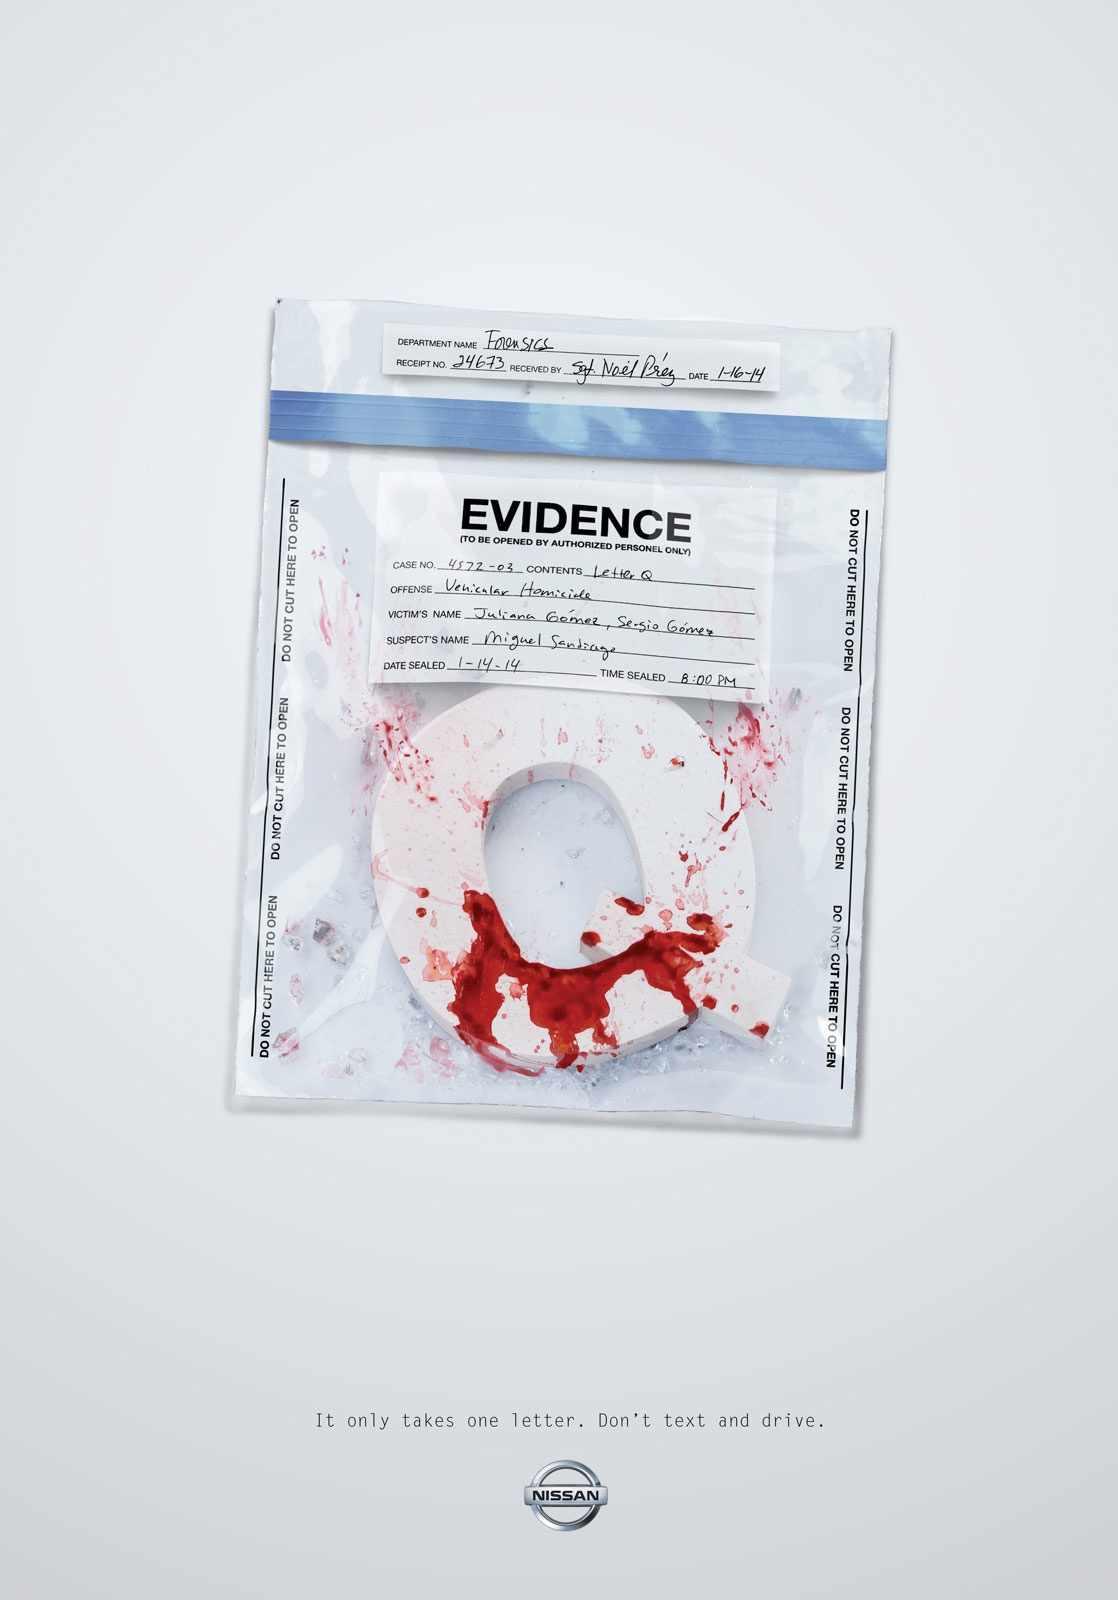 Iklan-Mobil-Nissan-Evidence-Q